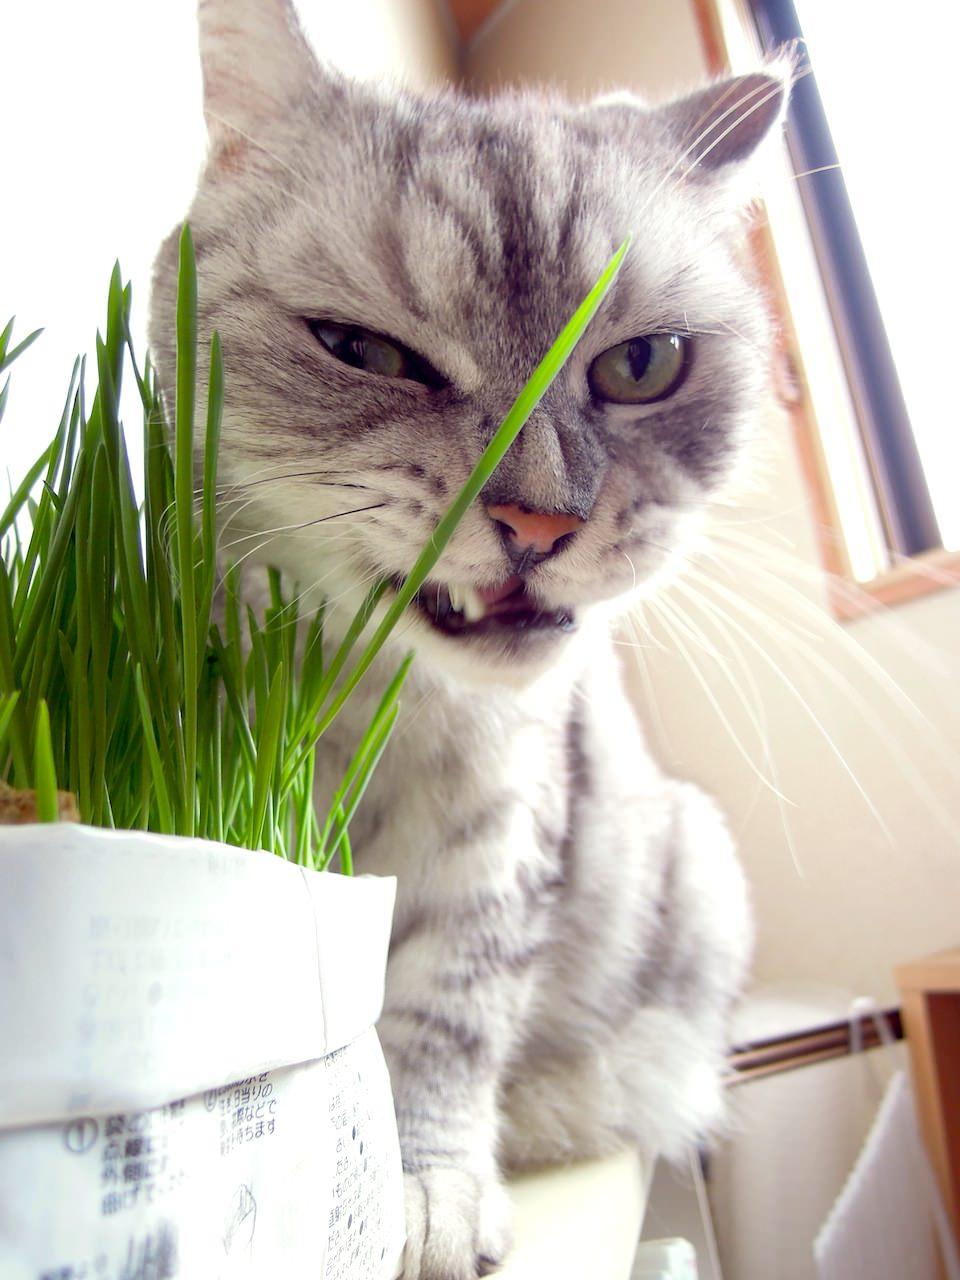 movie_Time Lapse Cat Grass Observation-13-2.jpg